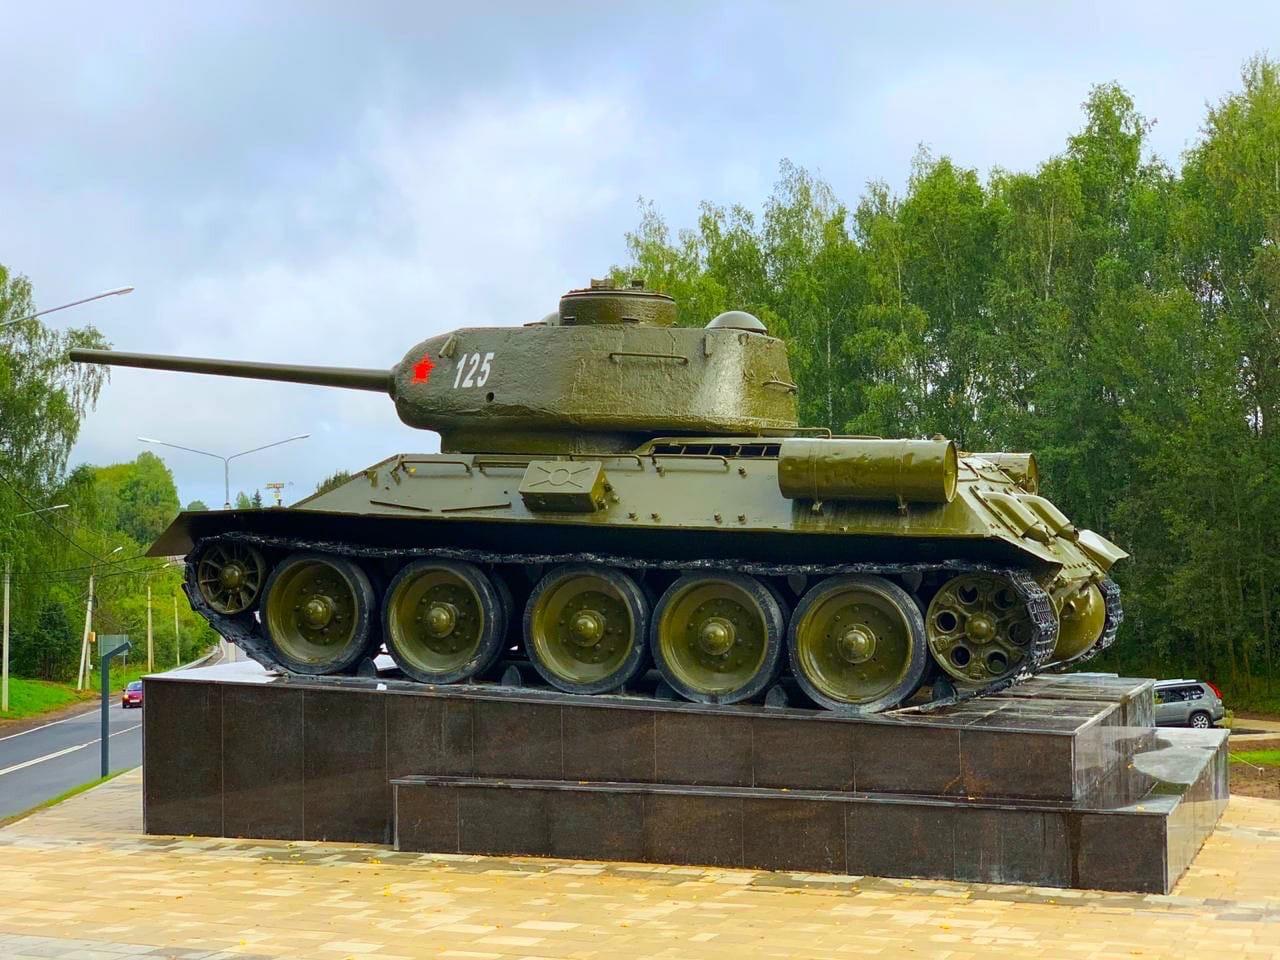 Сегодня завершено благоустройство территории на въезде в город у Танка Т-34 ✨